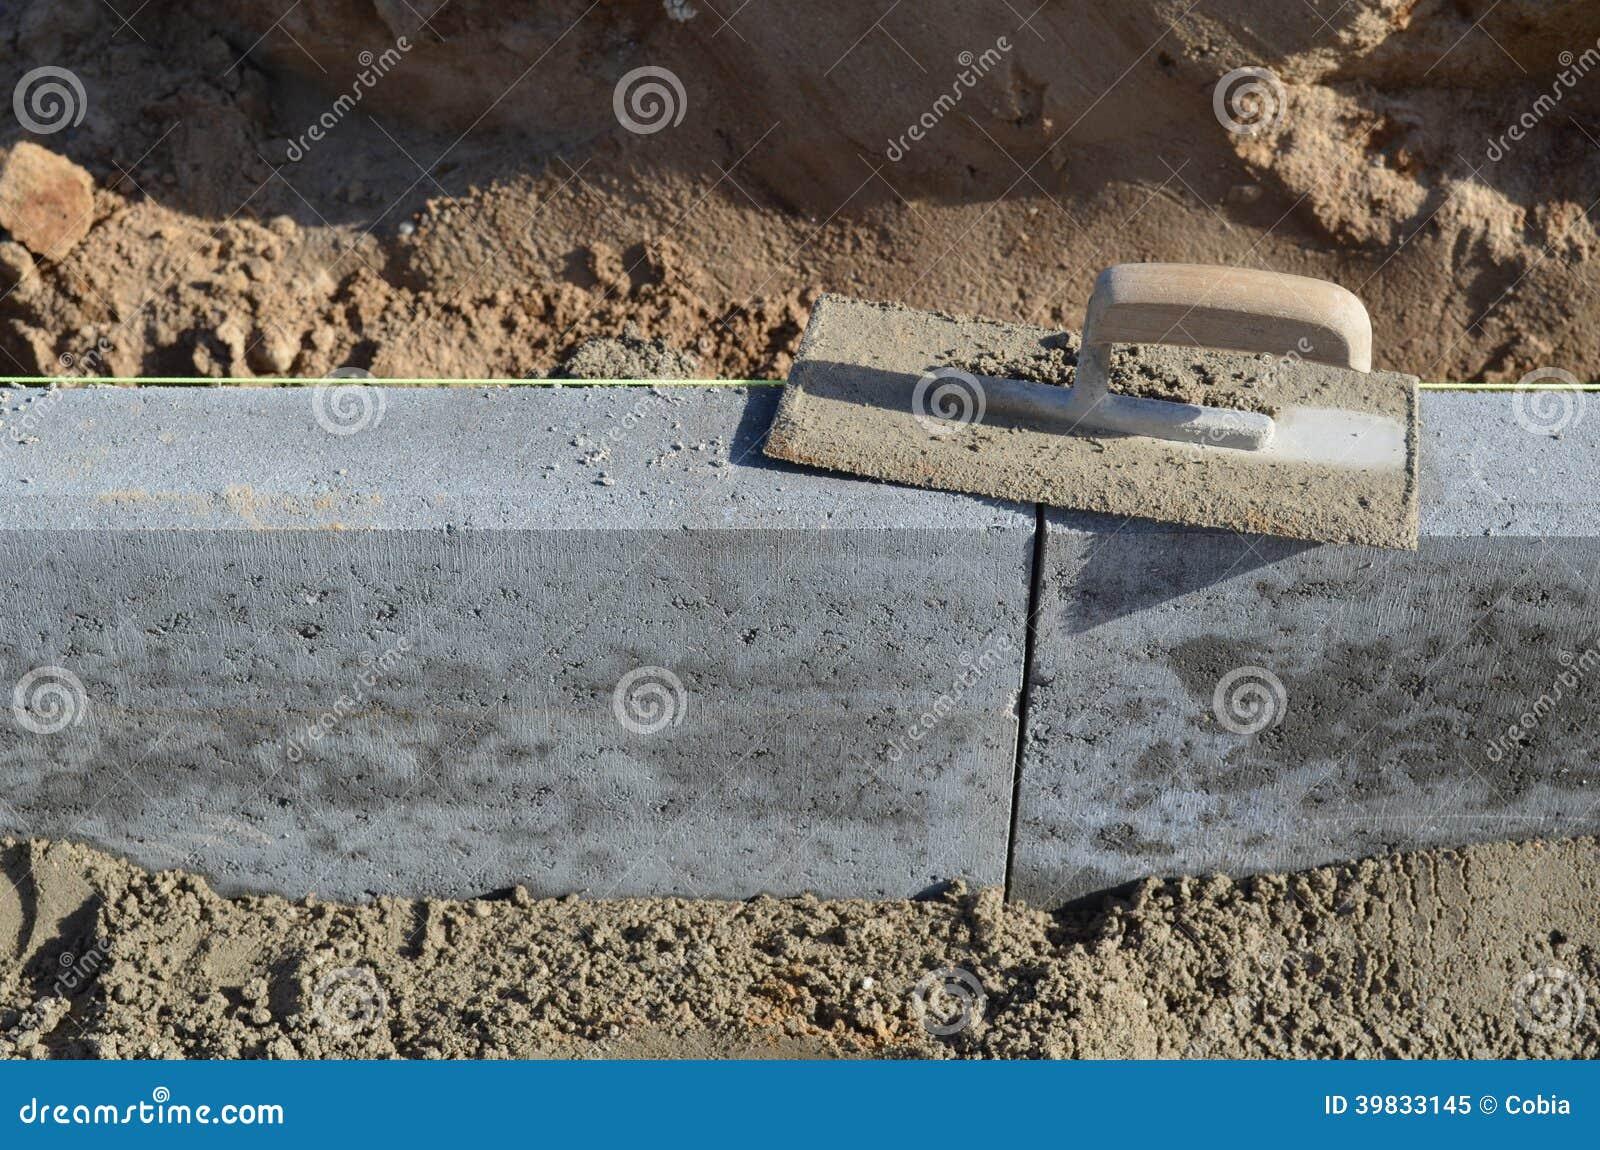 Setting a curbstone